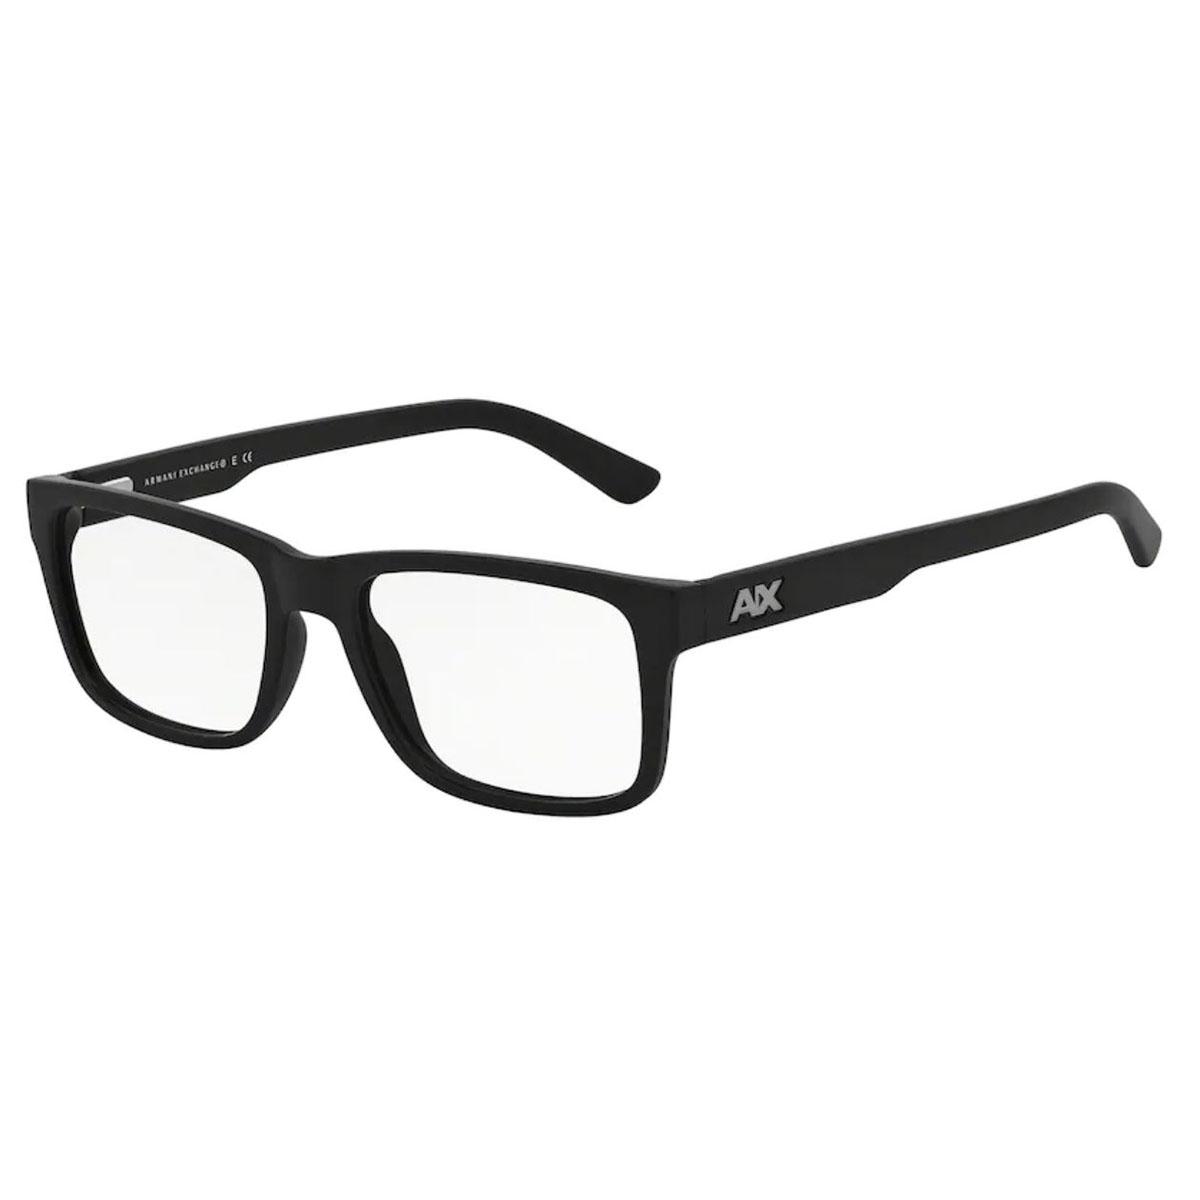 Óculos de Grau Armani Exchange AX3016L Preto Fosco Tamanho 53